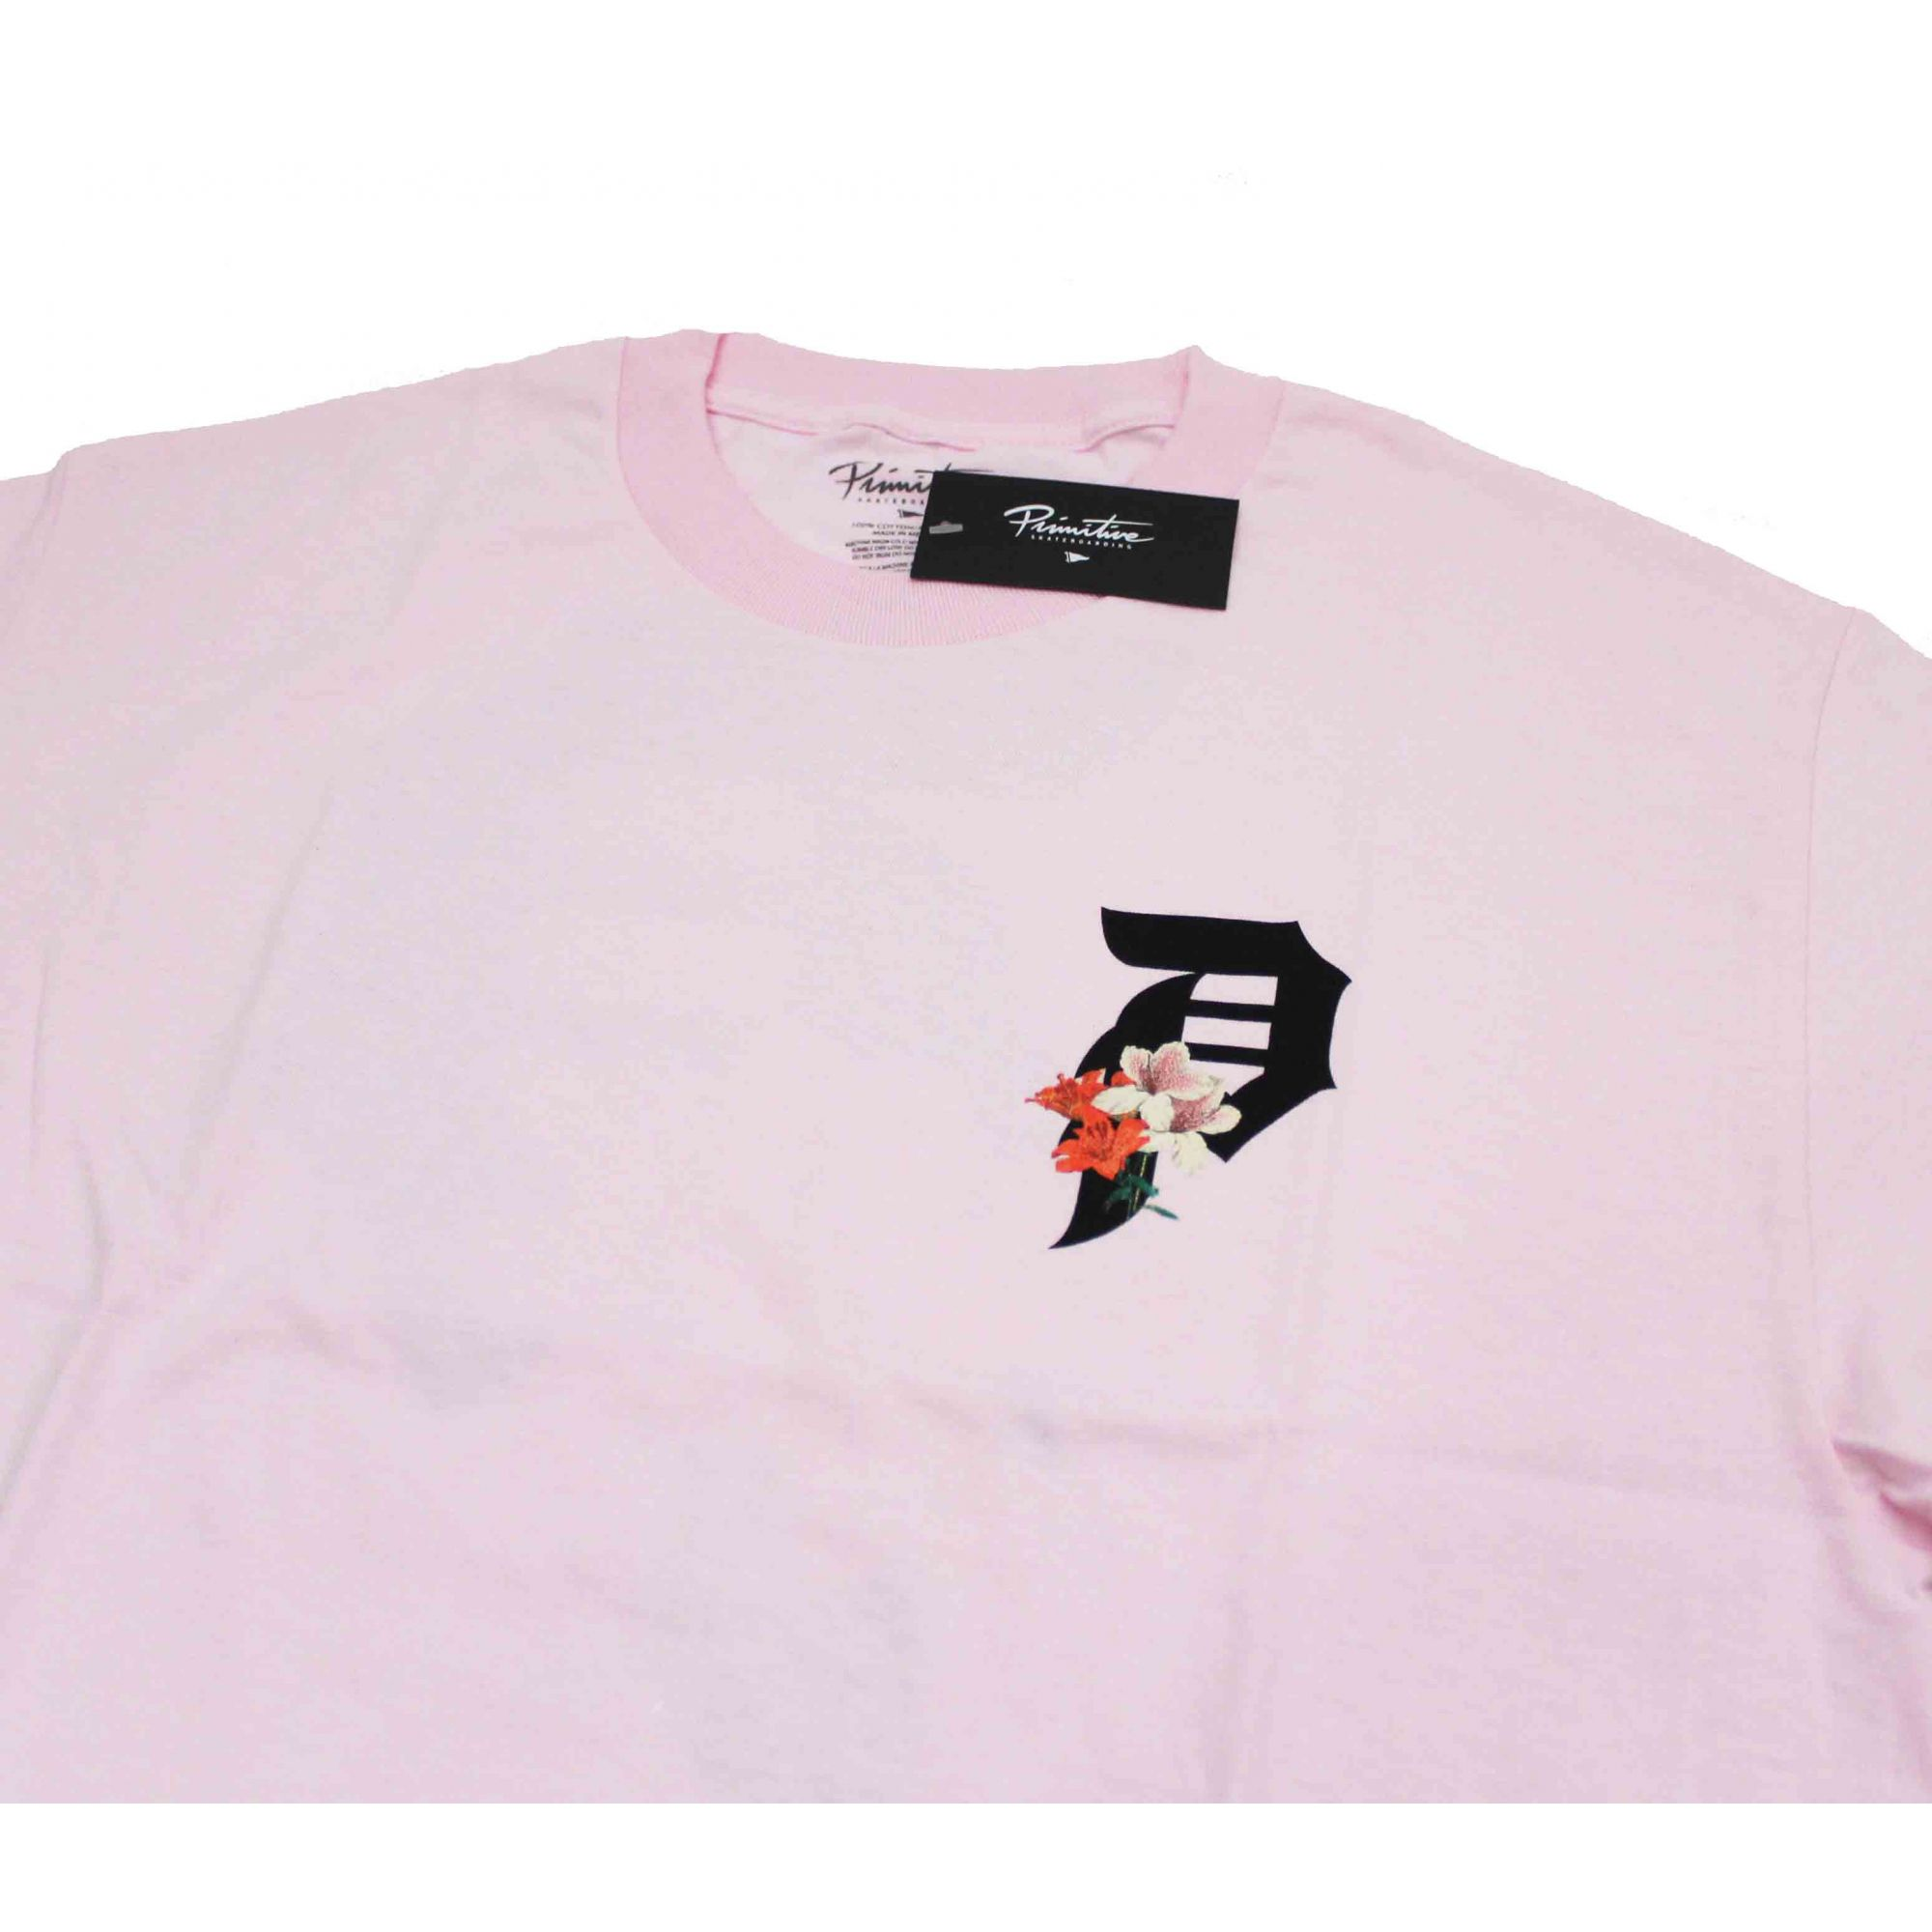 Camiseta Primitive Dirty P Lily Tee Rosa